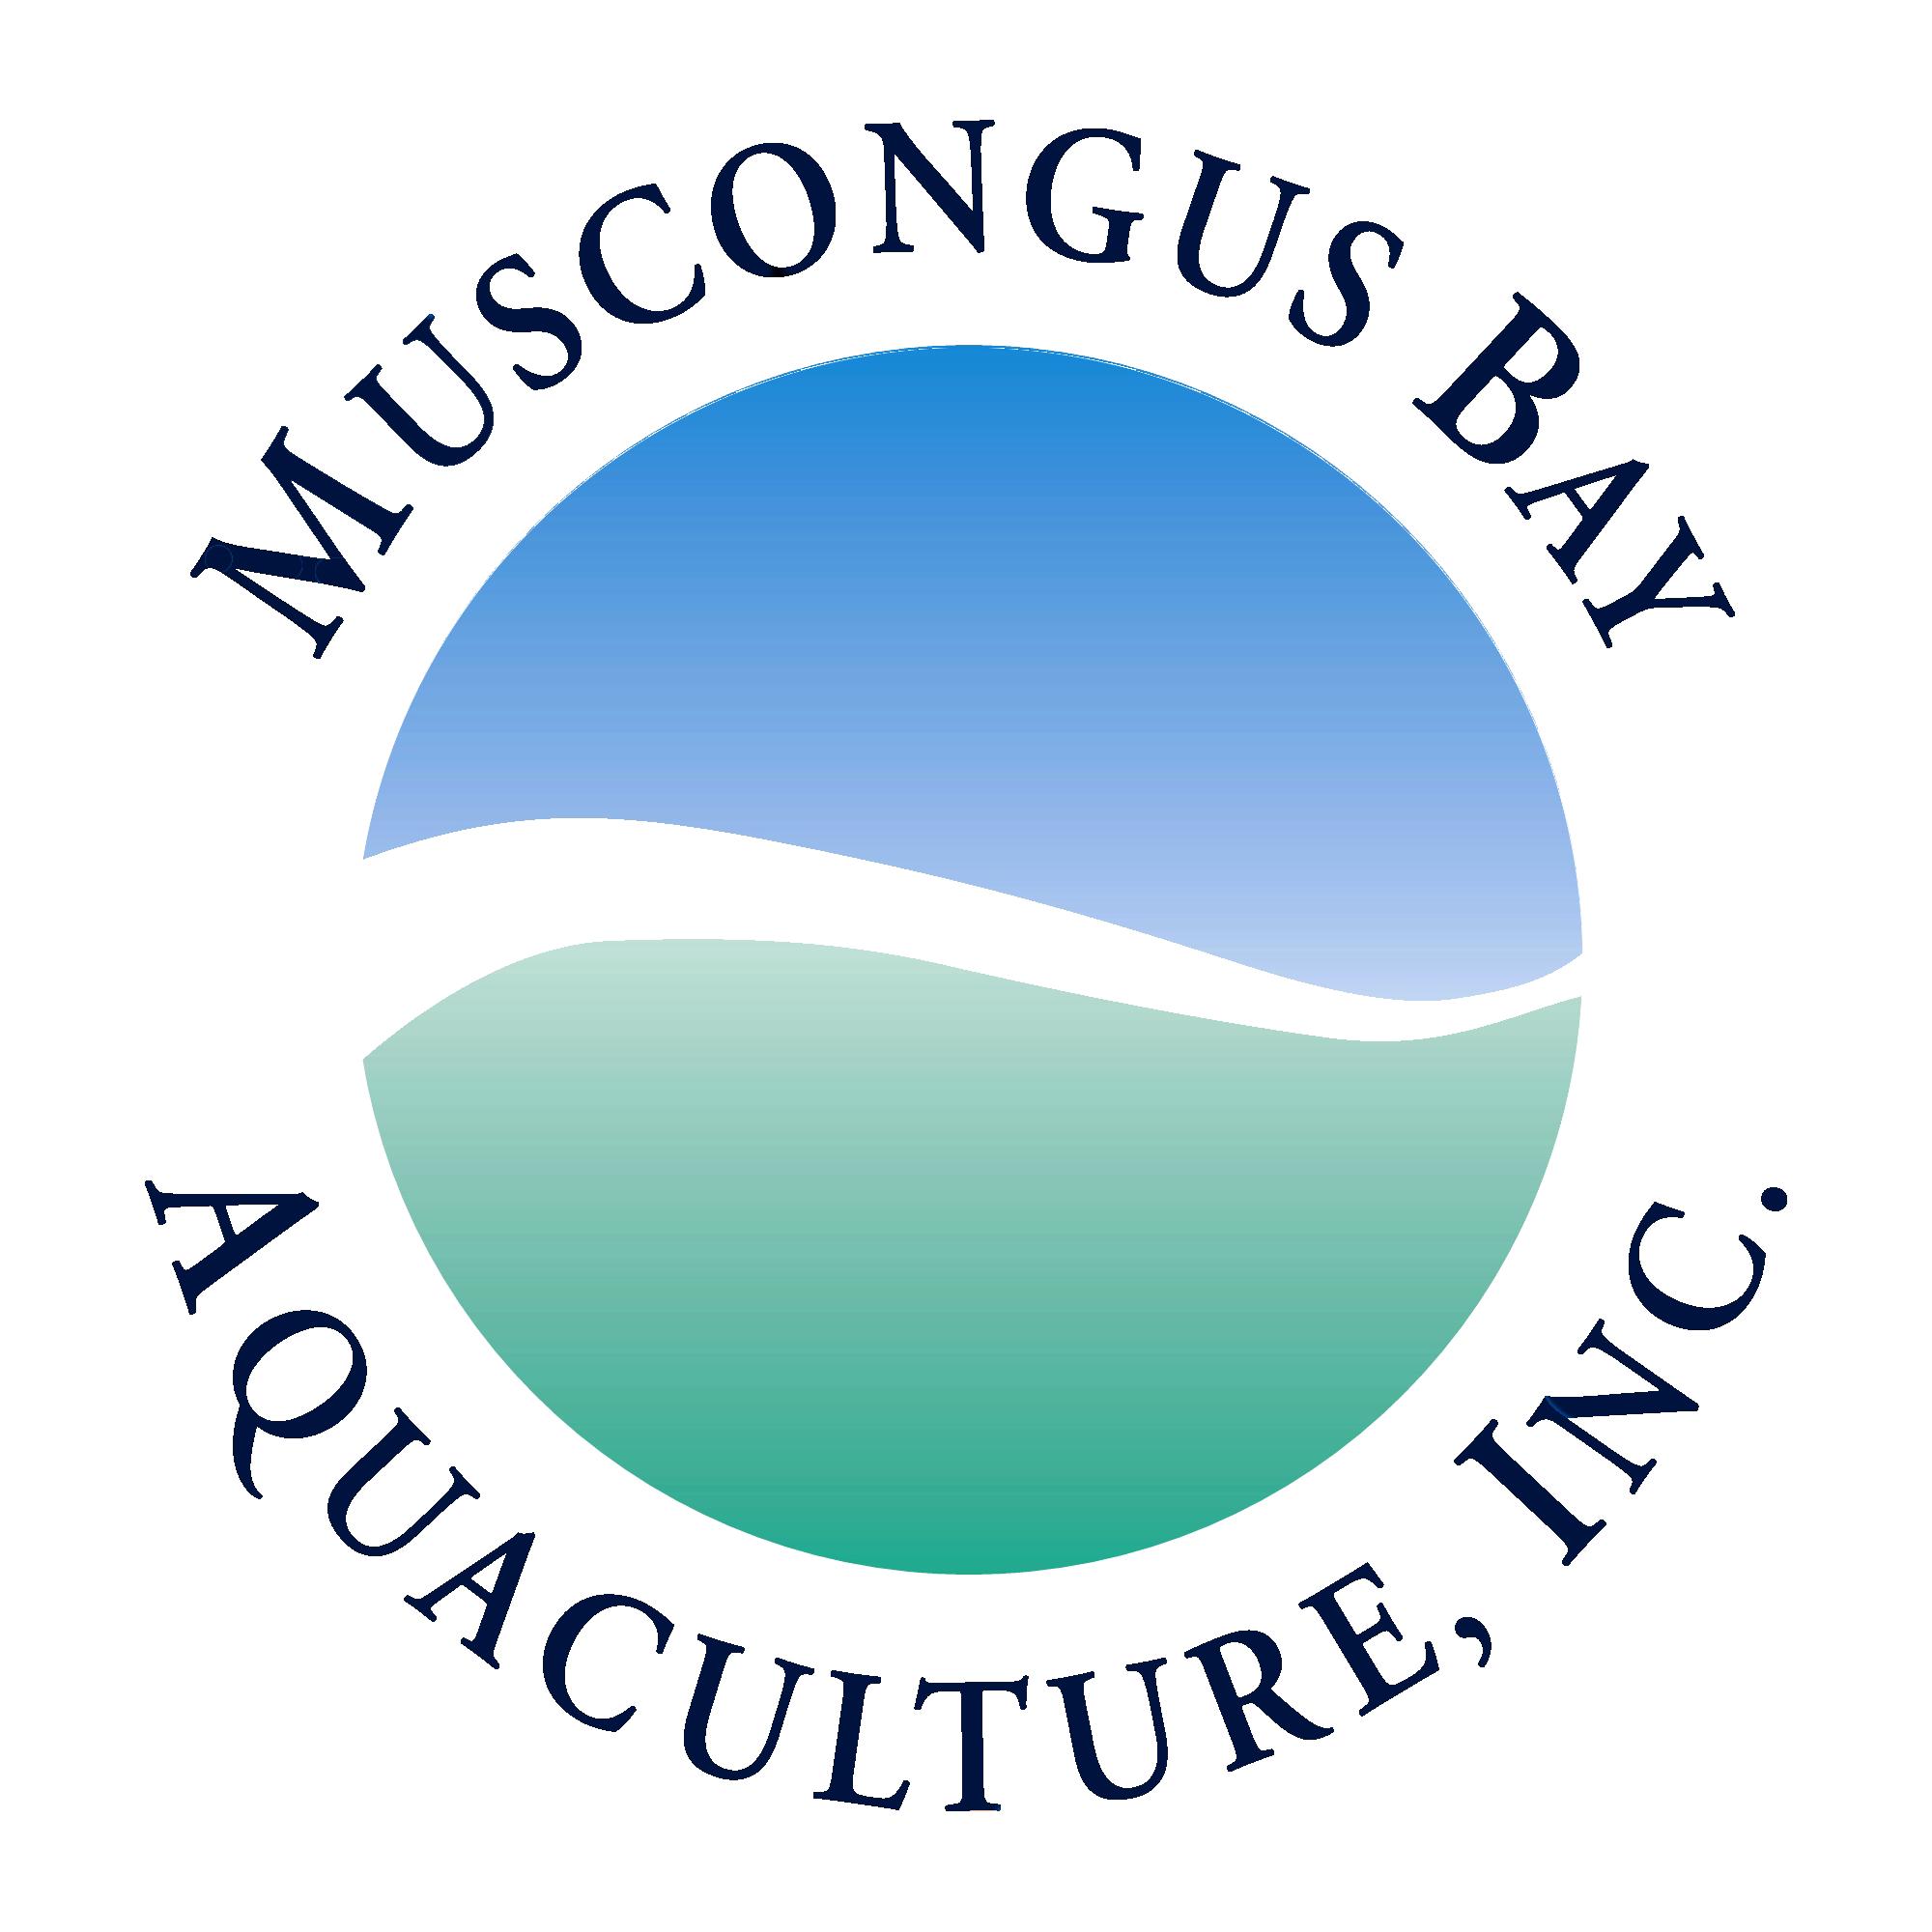 Muscongus circle logo.png